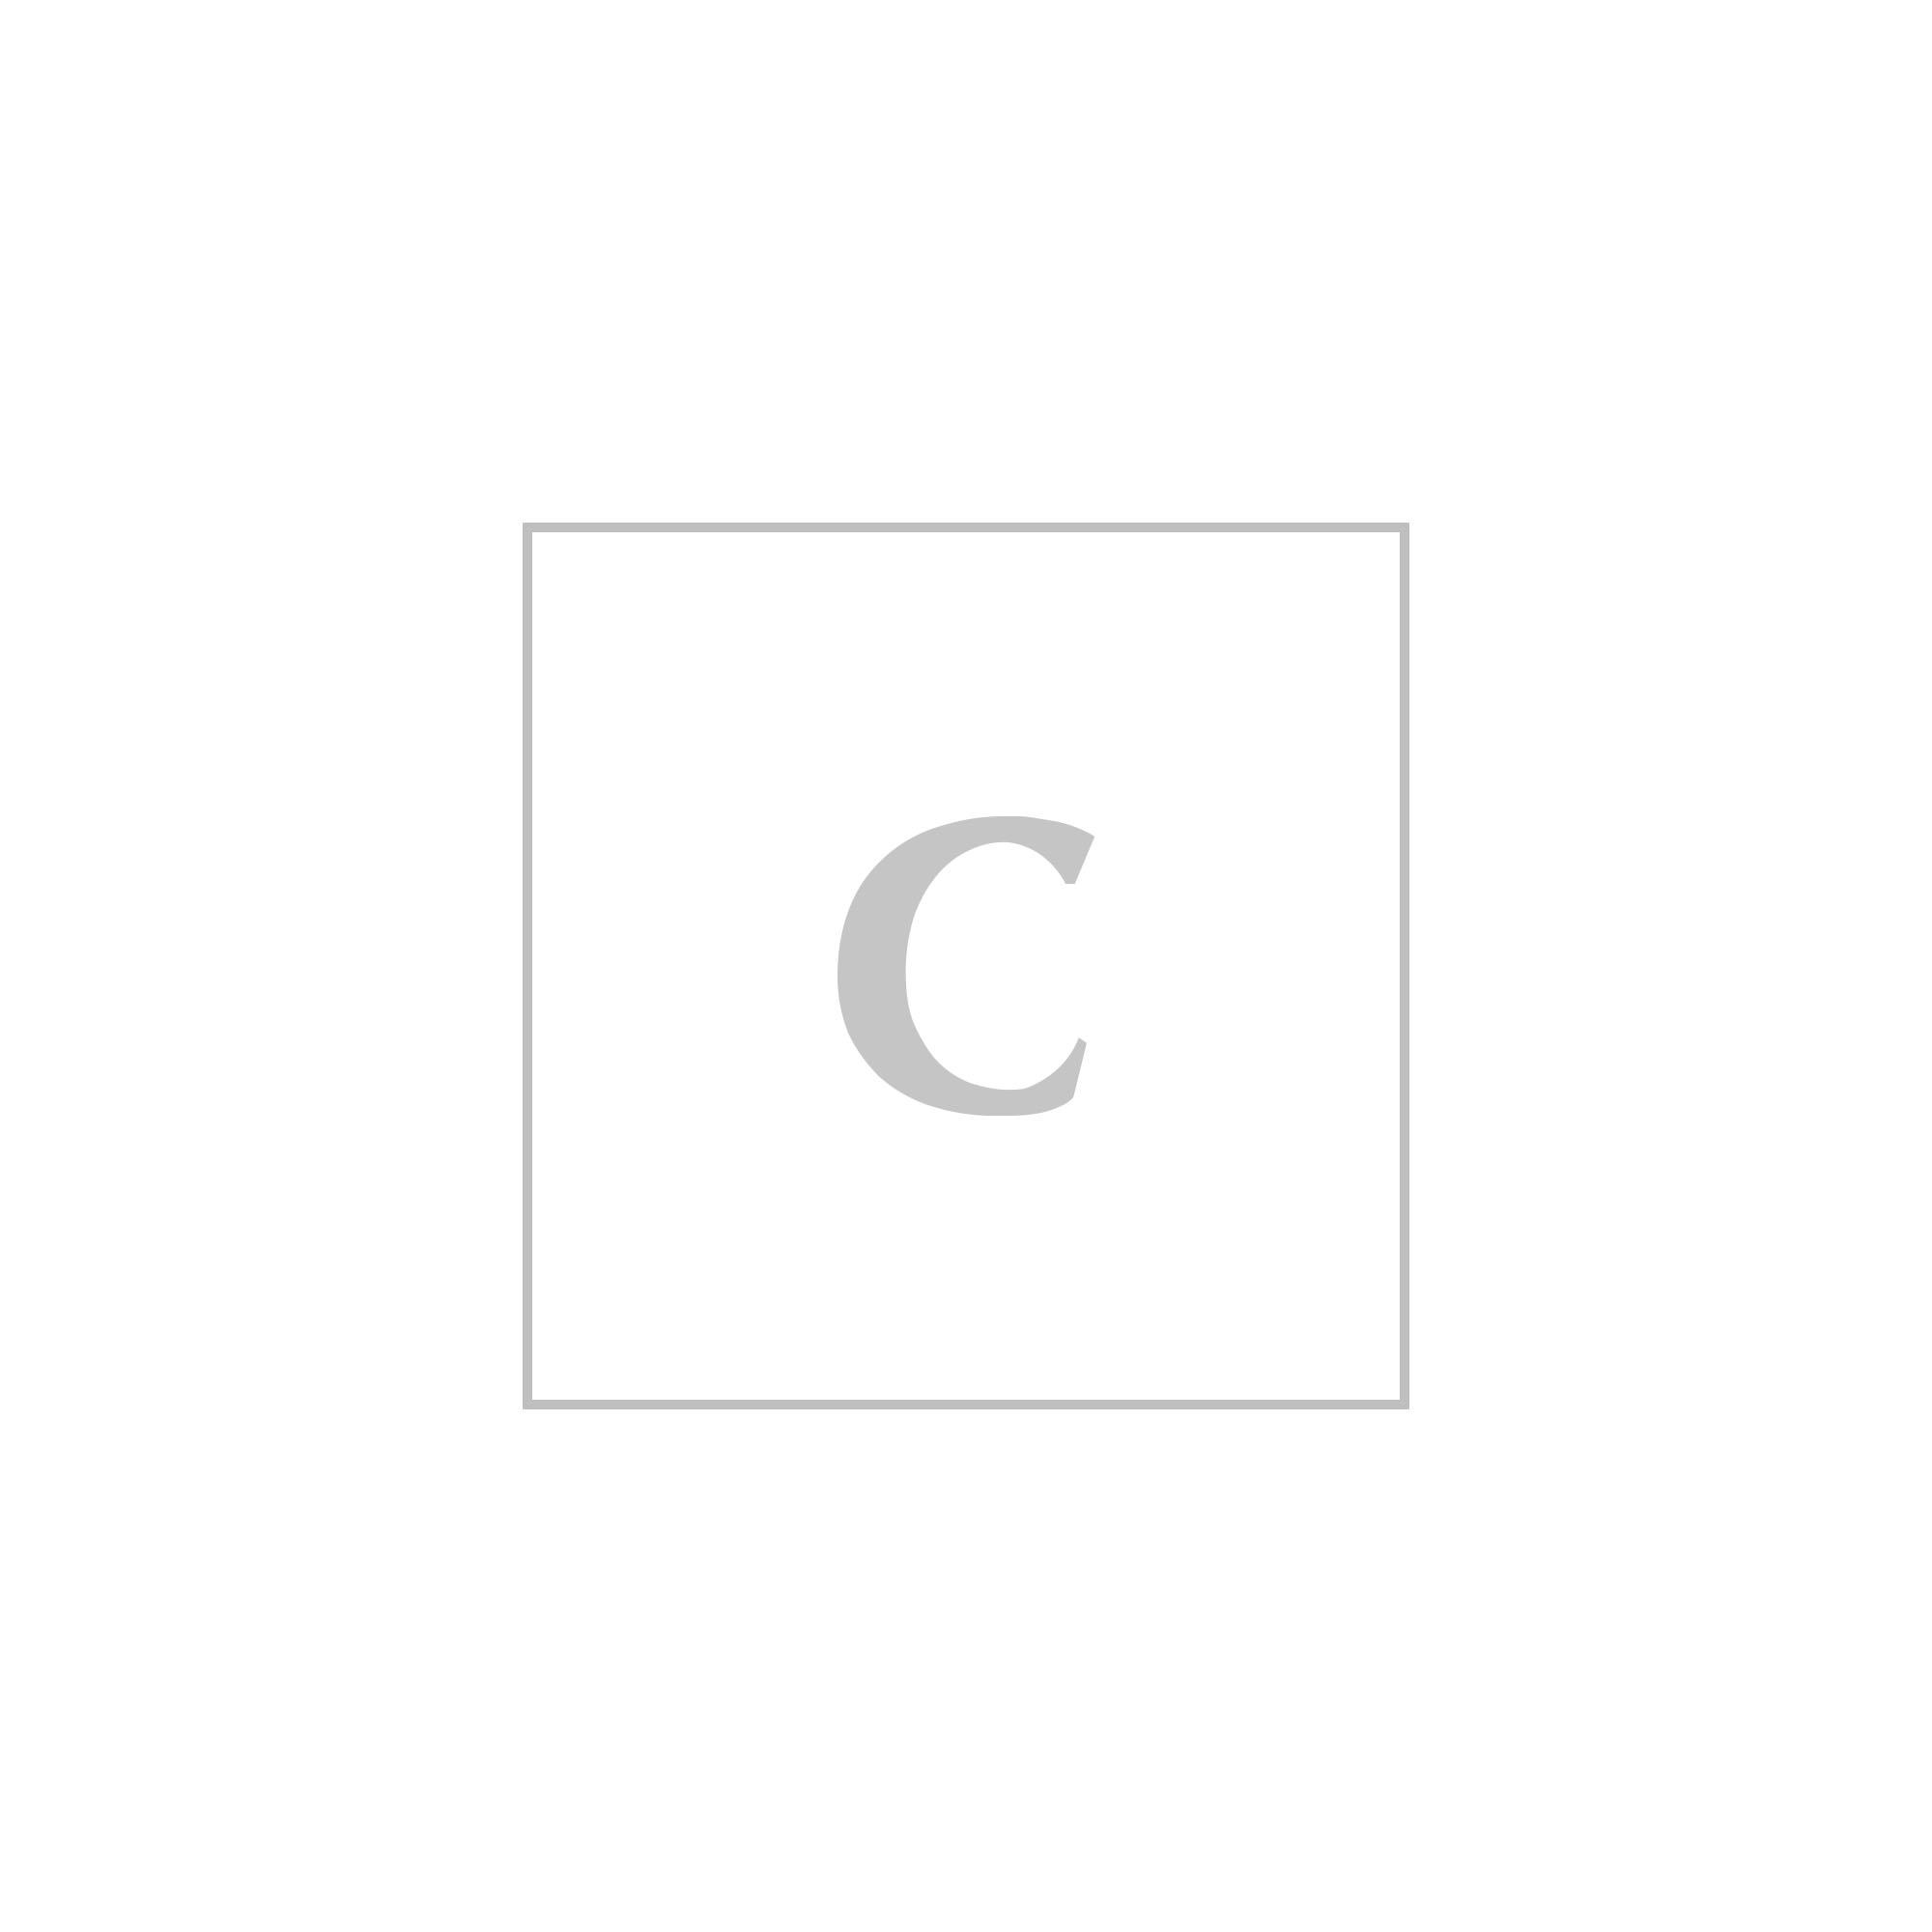 Dolce & gabbana triangolo scorrevole e tanga